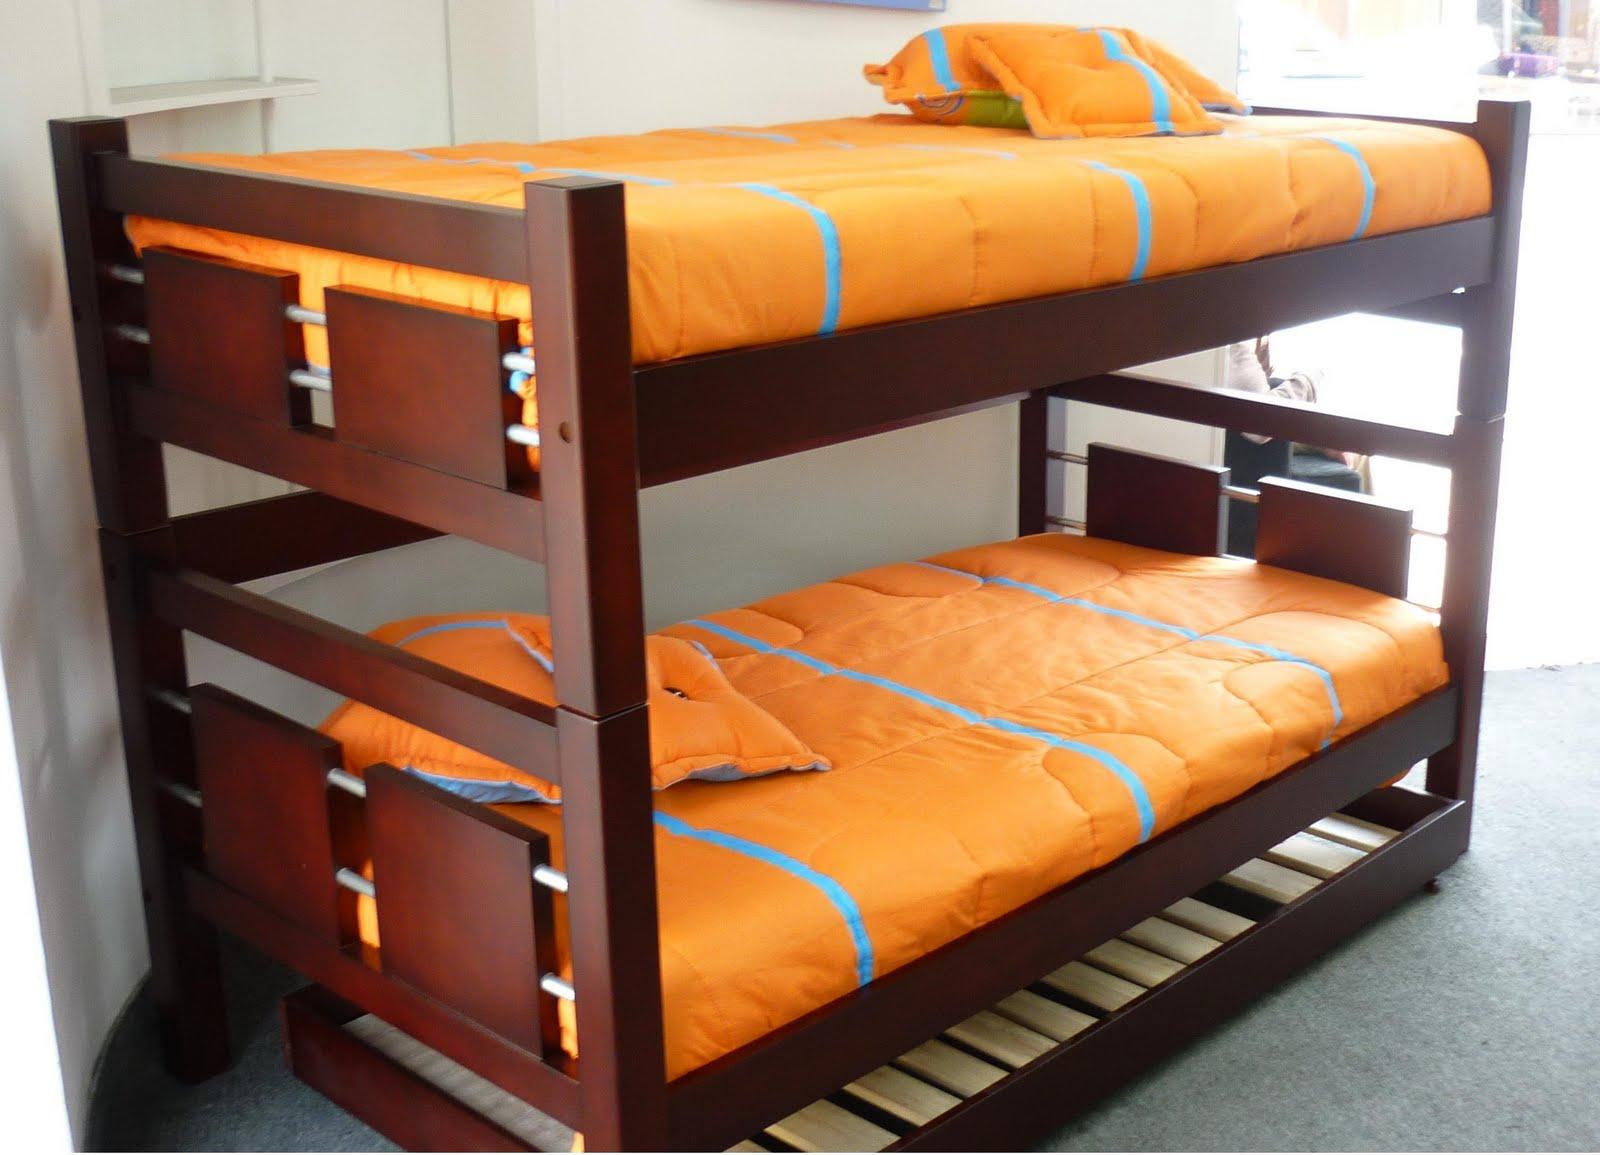 Muebles deko medellin obtenga ideas dise o de muebles for Muebles medellin economicos